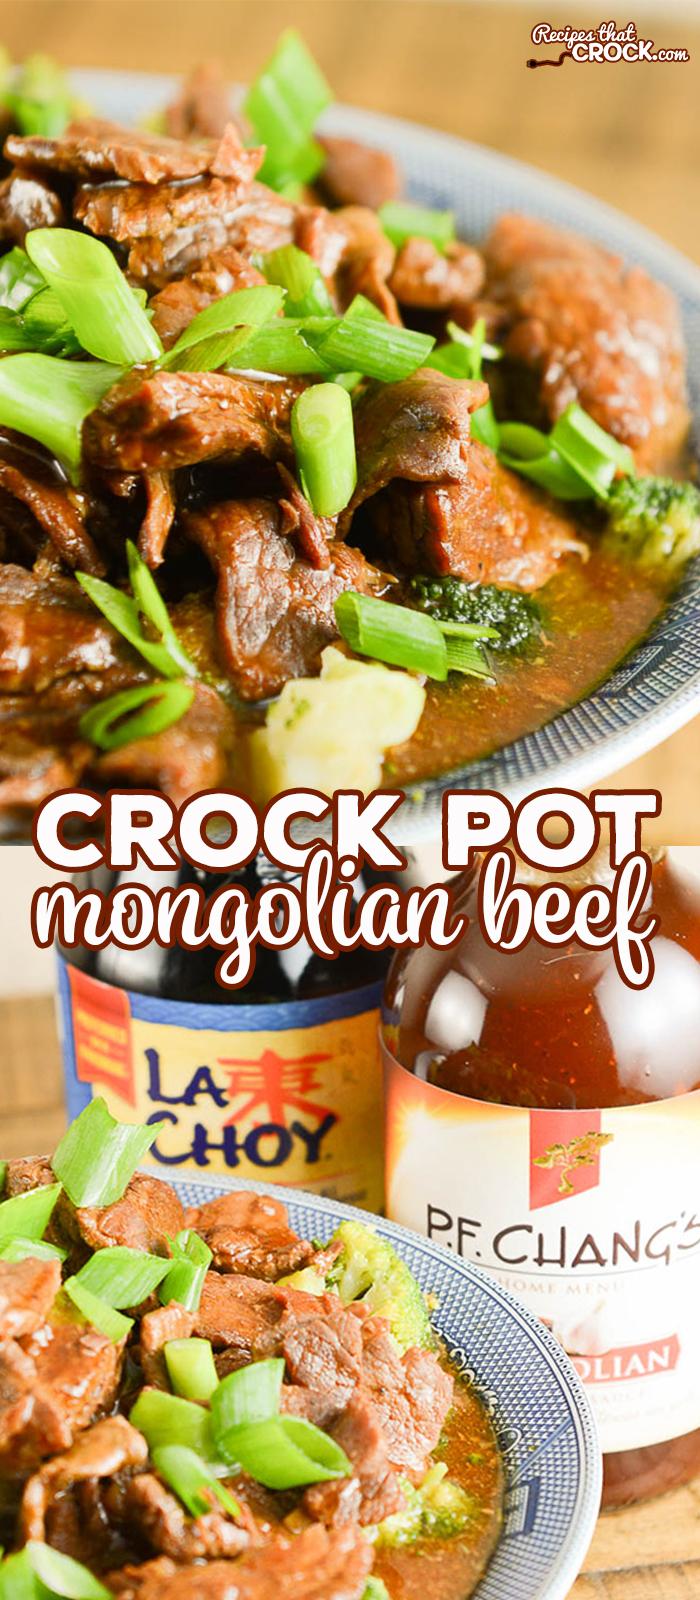 Easy Crock Pot Mongolian Beef - Recipes That Crock!